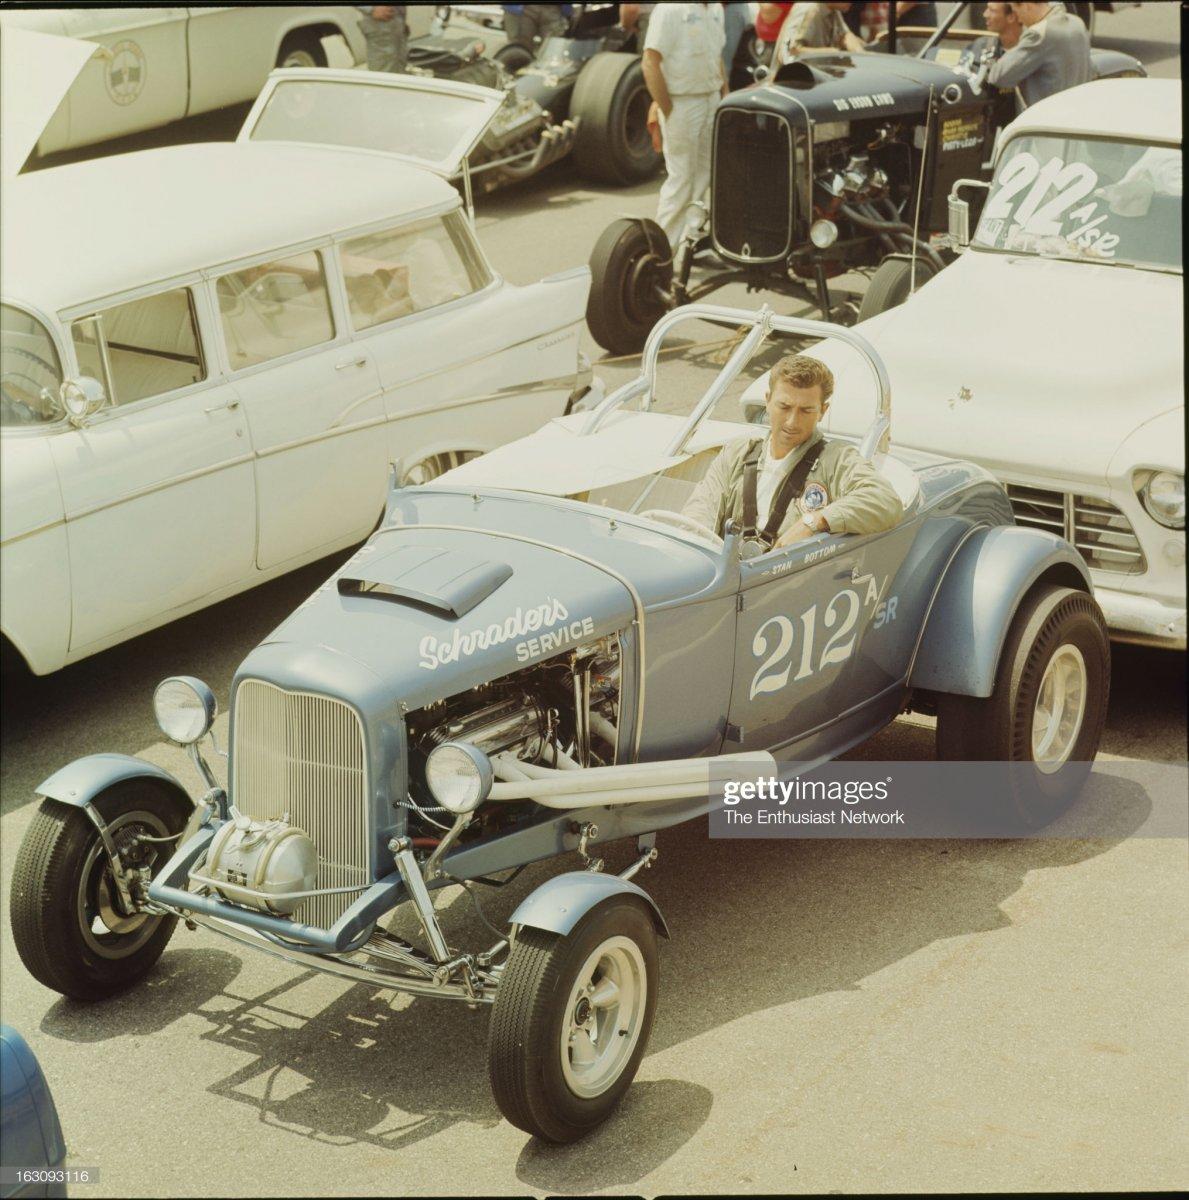 27 1965 Hot Rod Maga.jpg